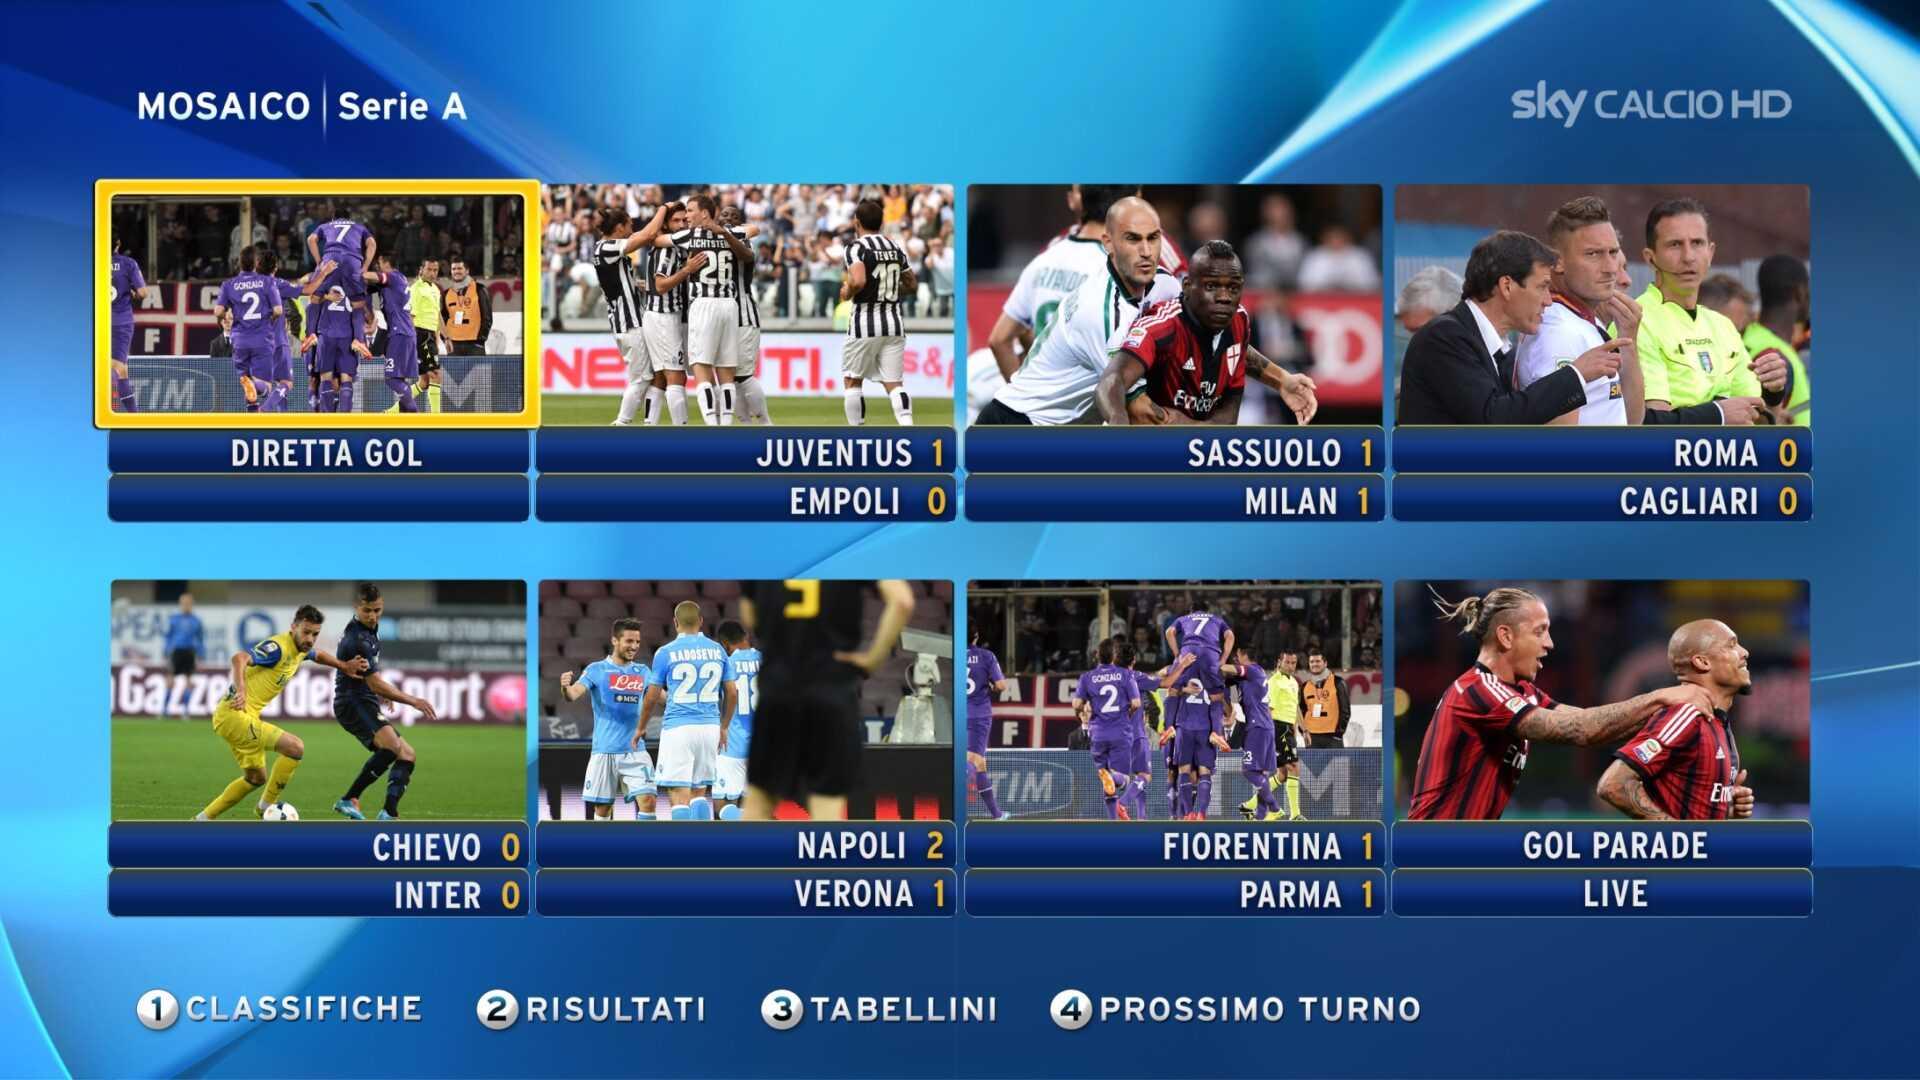 L'offerta calcio di Sky 2014 - 2015 in anteprima | Digitale terrestre: Dtti.it